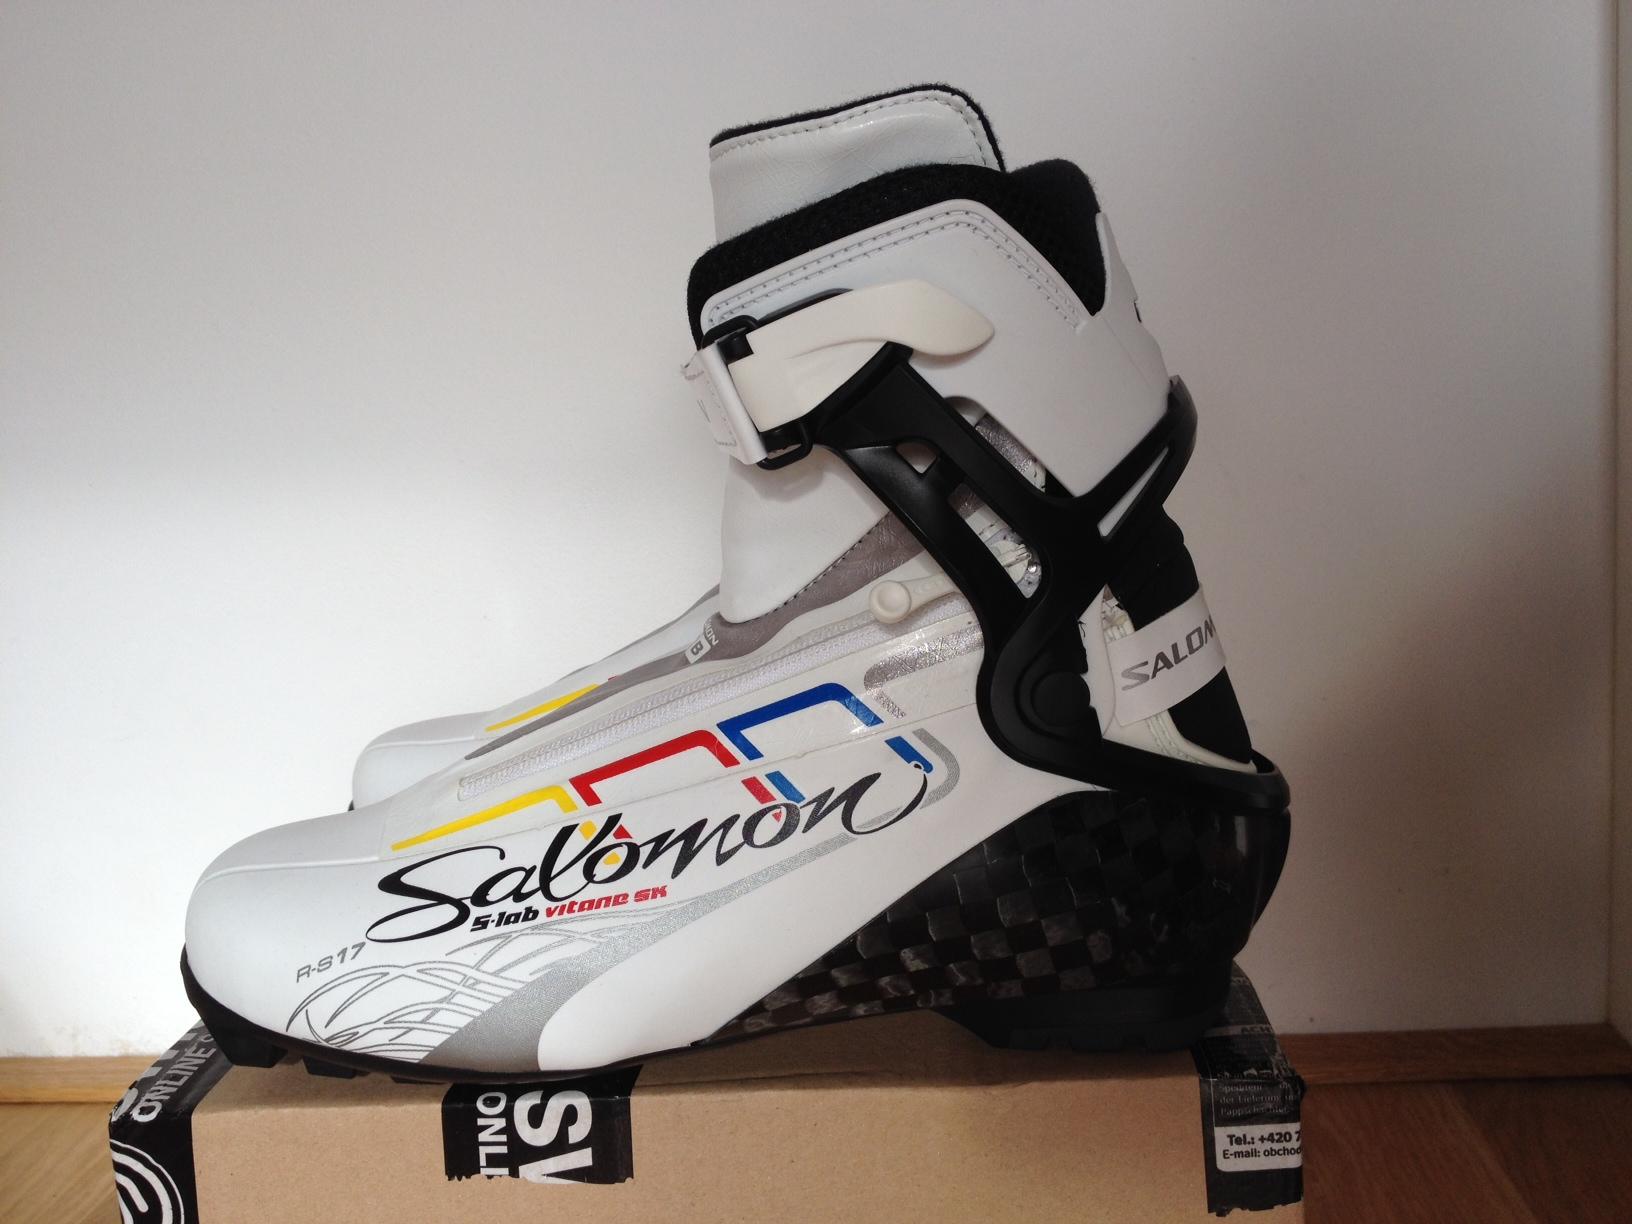 Dám. boty Salomon S-lab Vitane skate R-S17 177fe5d802